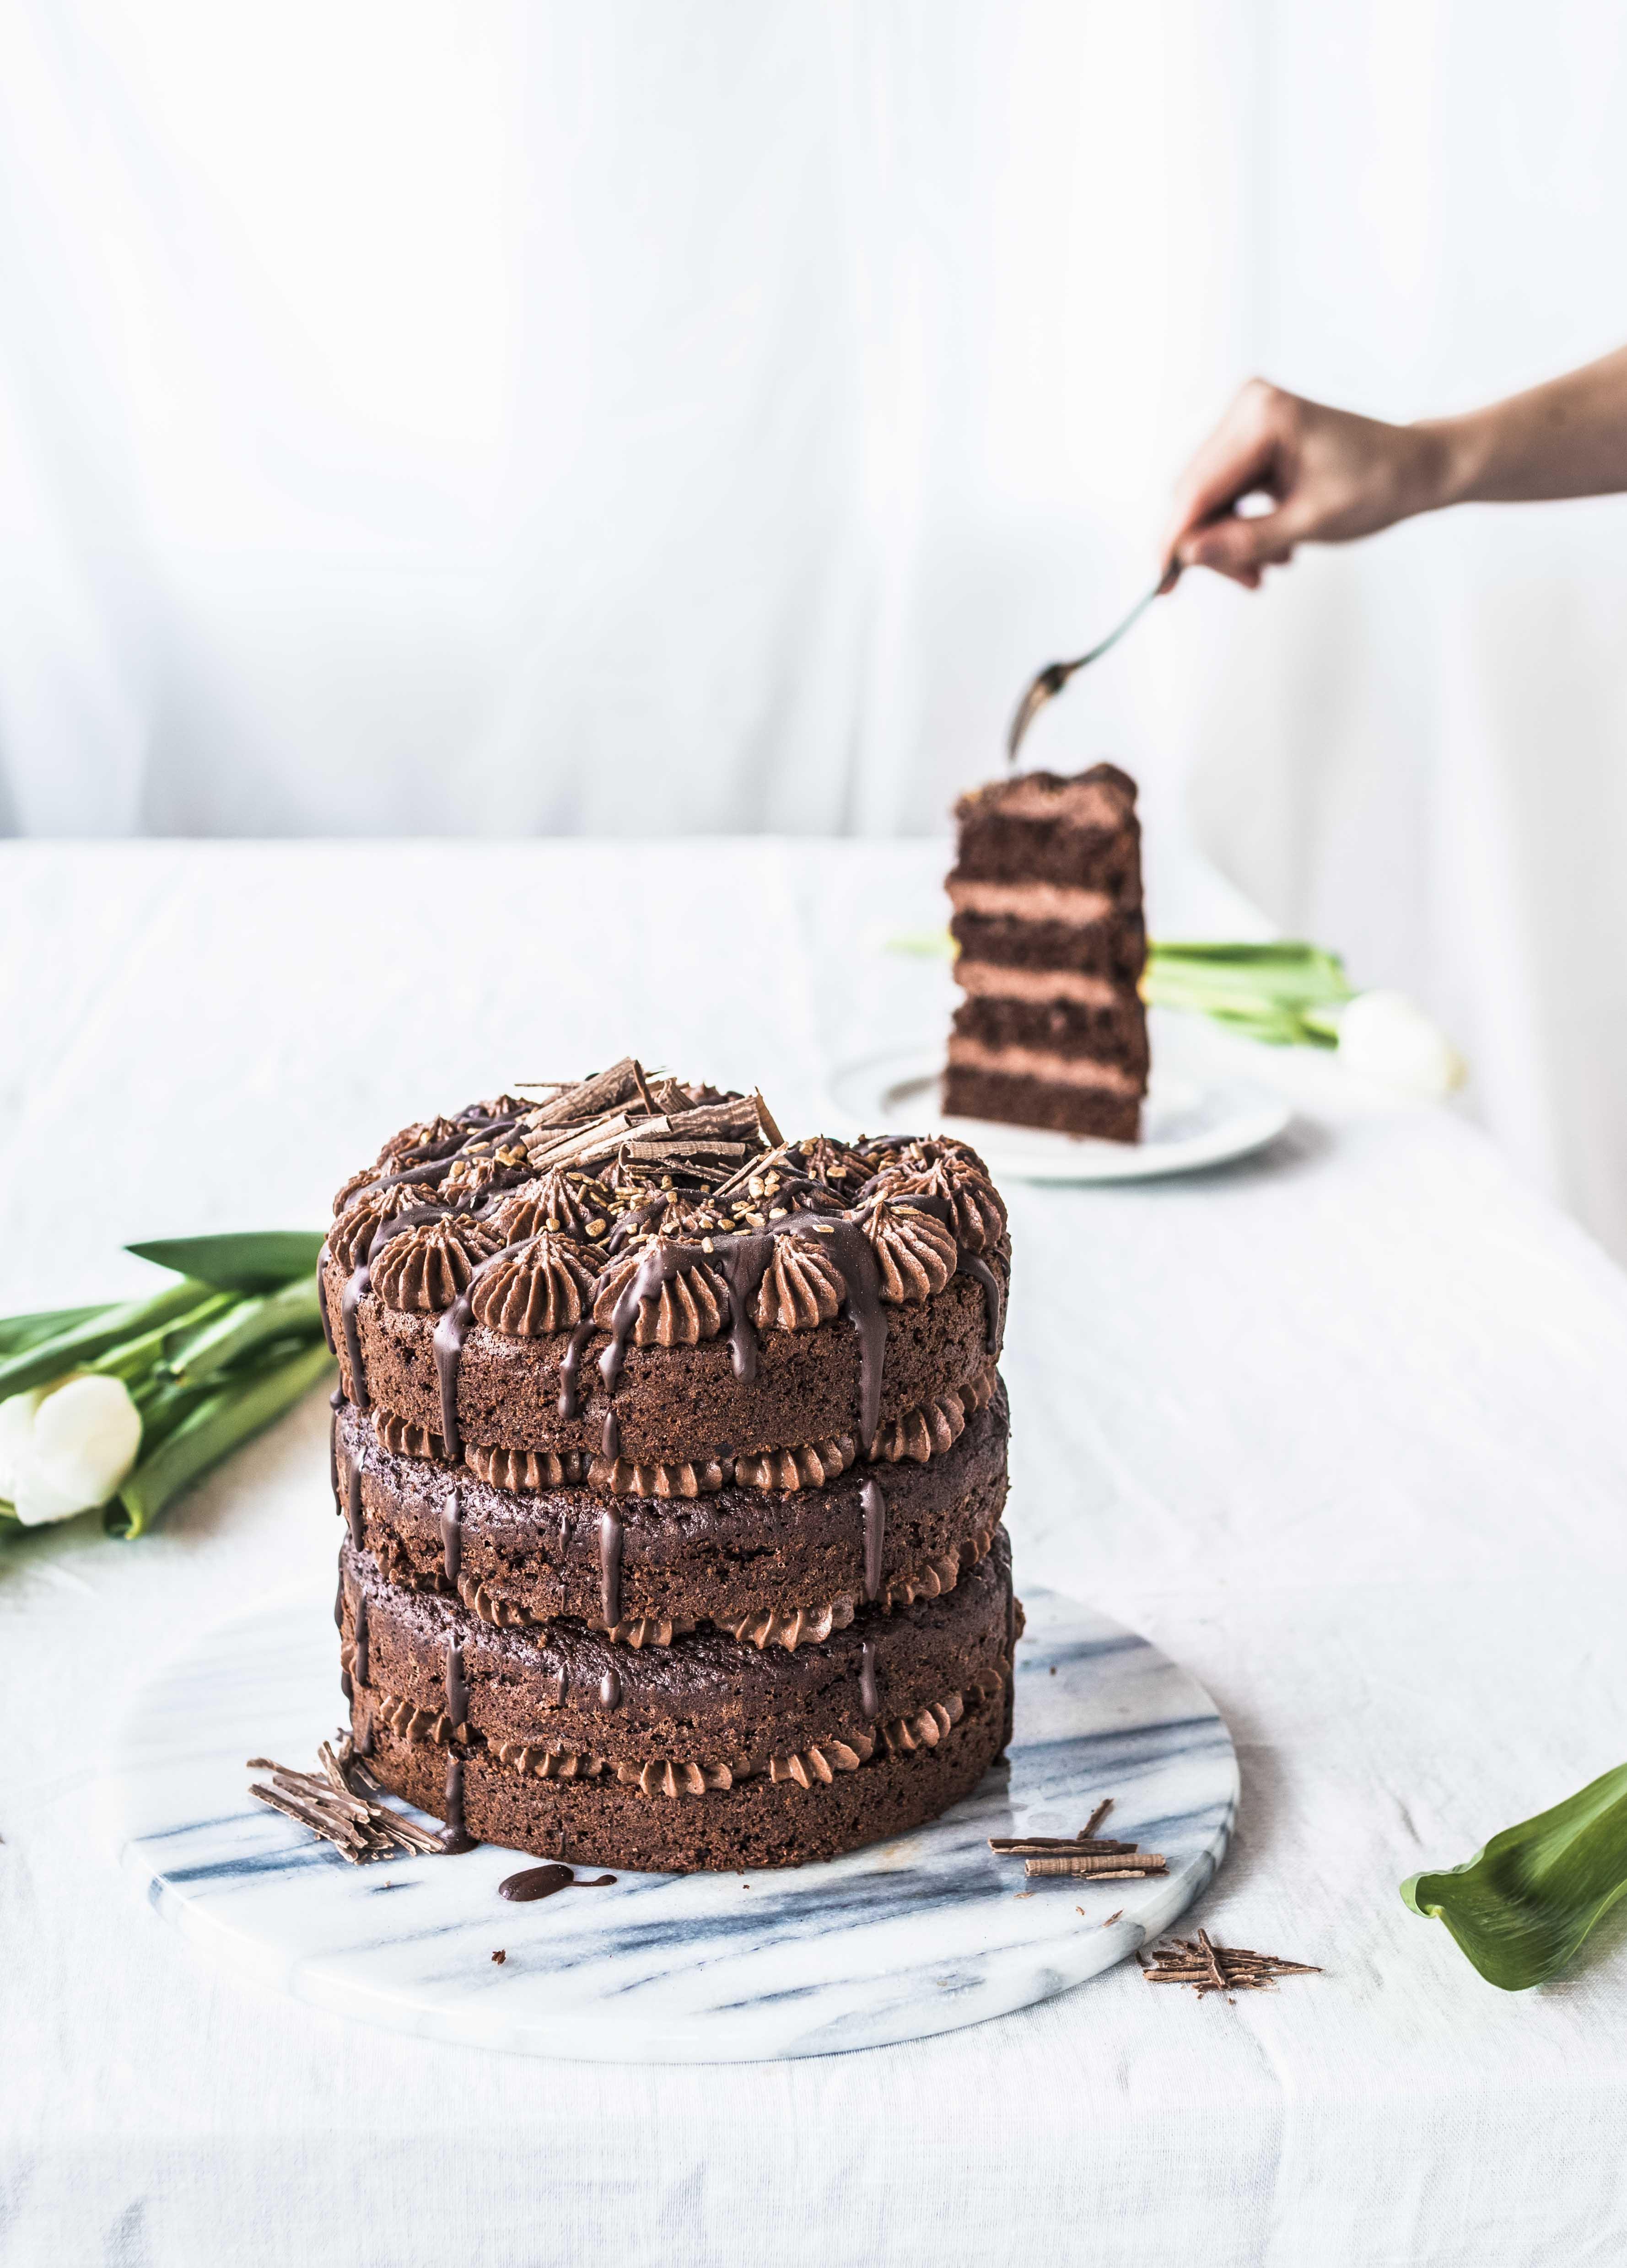 Mokkakakku - Mocha Cake Recipe